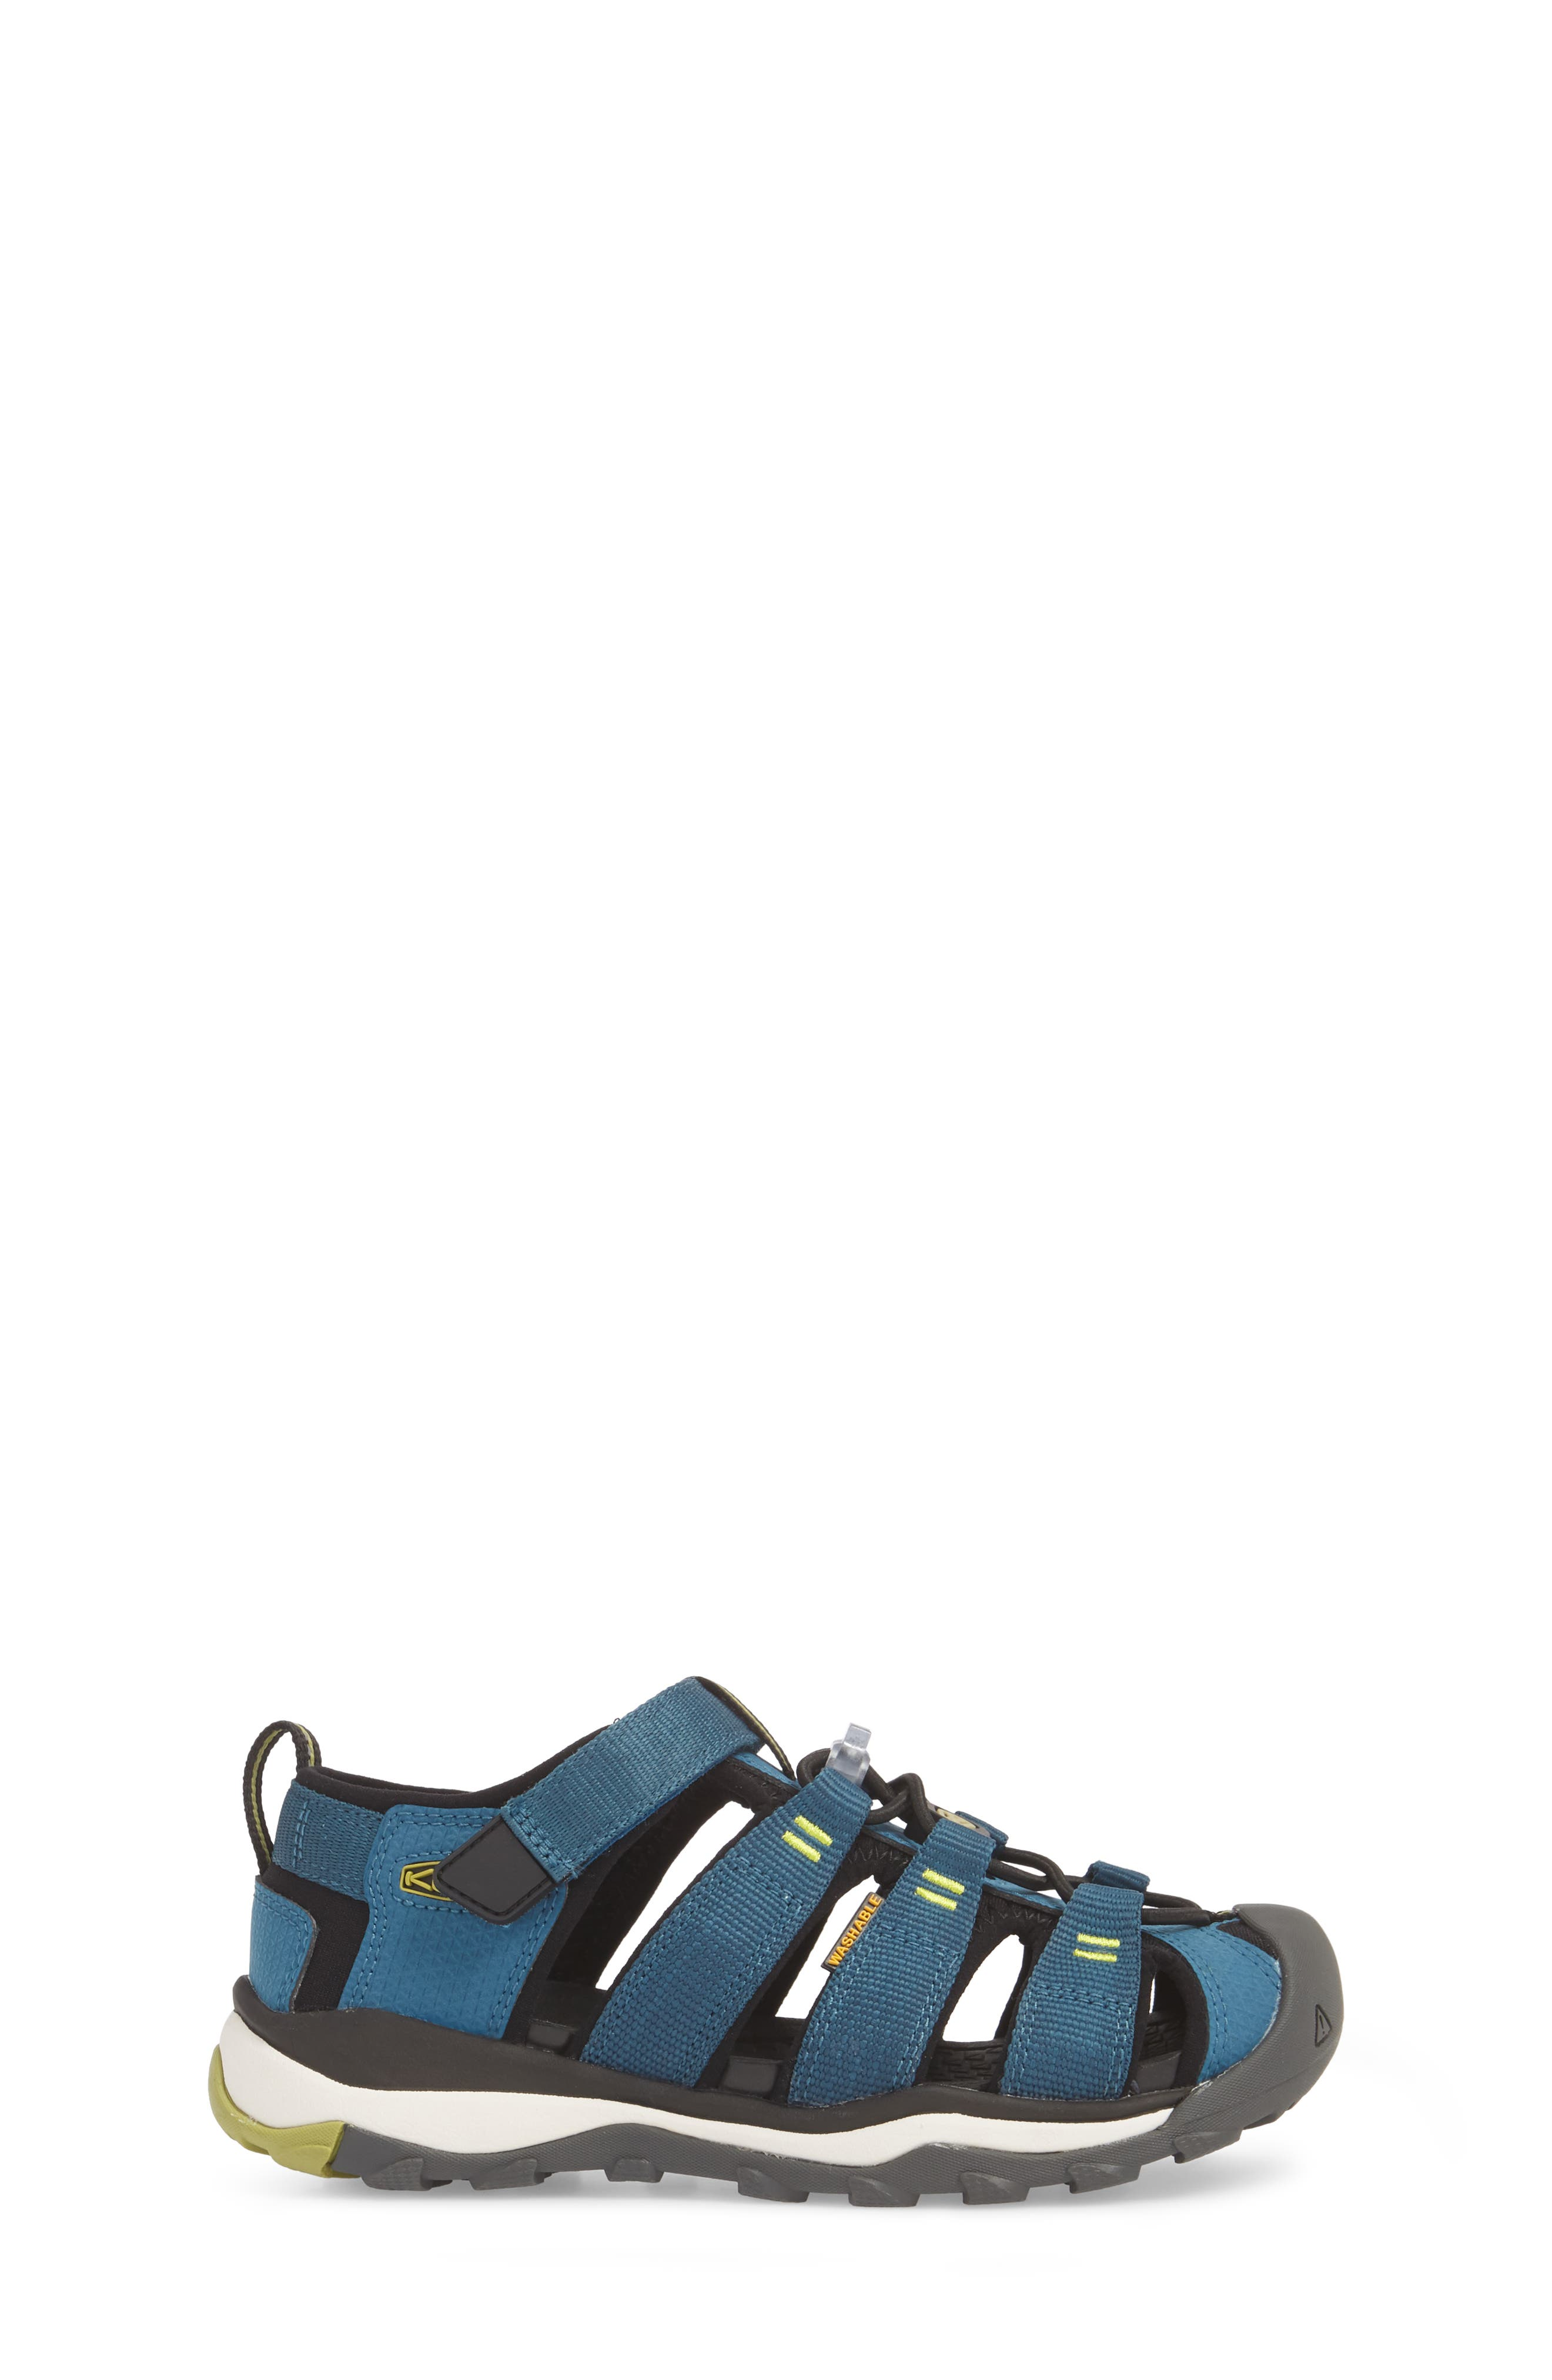 Newport Neo H2 Water Friendly Sandal,                             Alternate thumbnail 3, color,                             LEGION BLUE/ MOSS